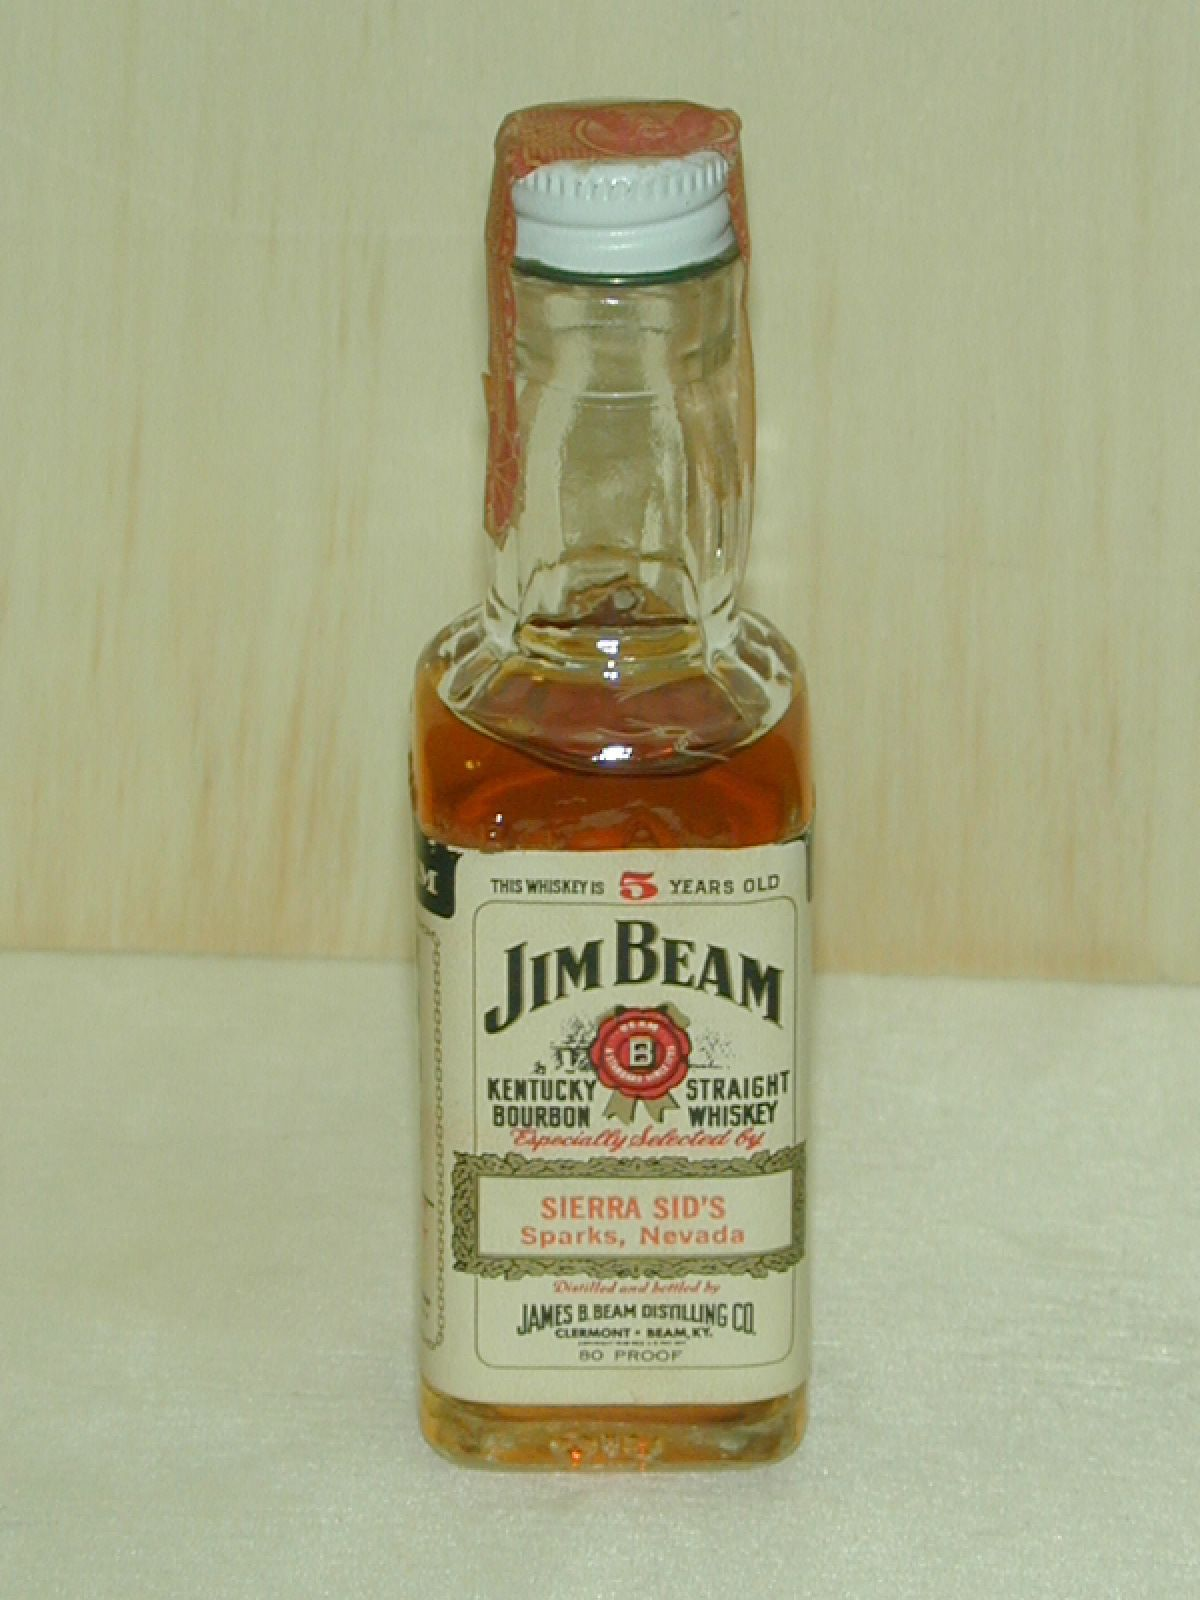 Jim Beam Small Liquor Bottles Jim Beam Scotch Whiskey